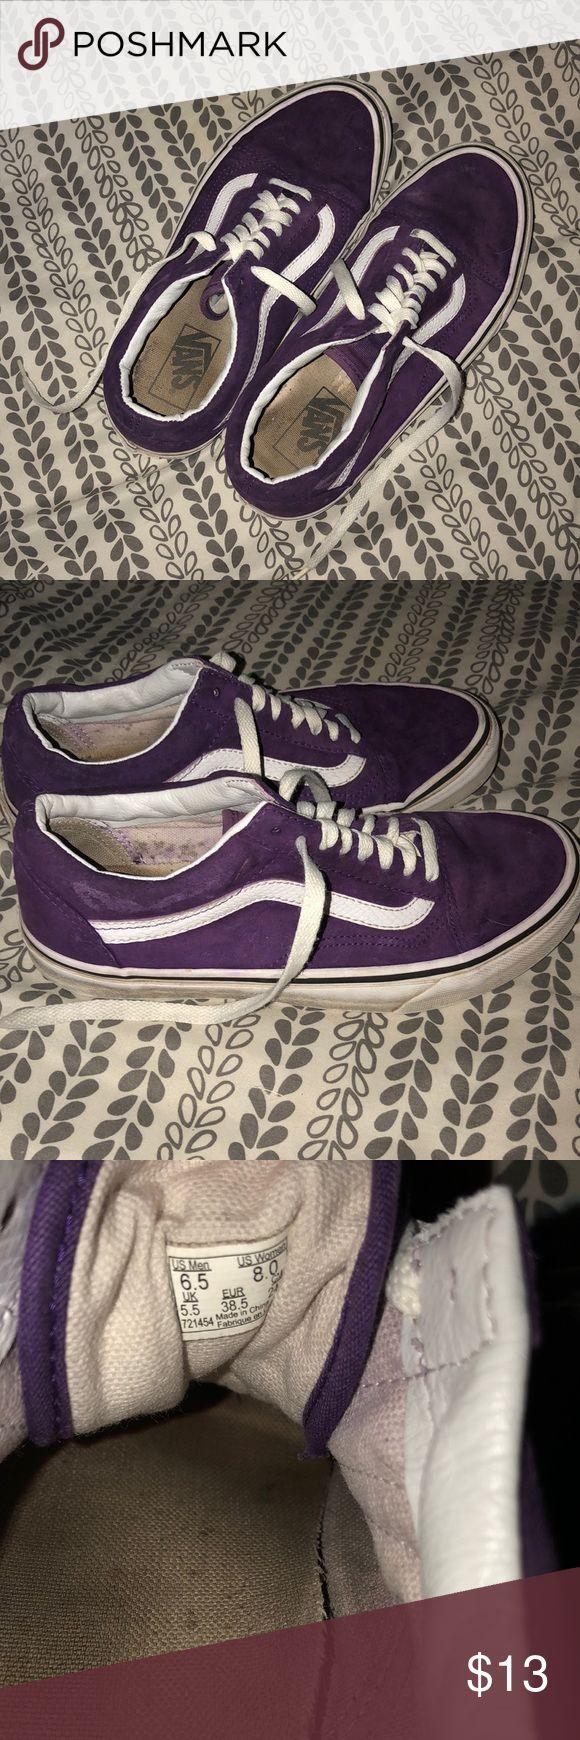 Purple Vans! Size me s 6.5 but equivalent to a women's 8.0. Worn condition but clean. Vans Shoes Sneakers